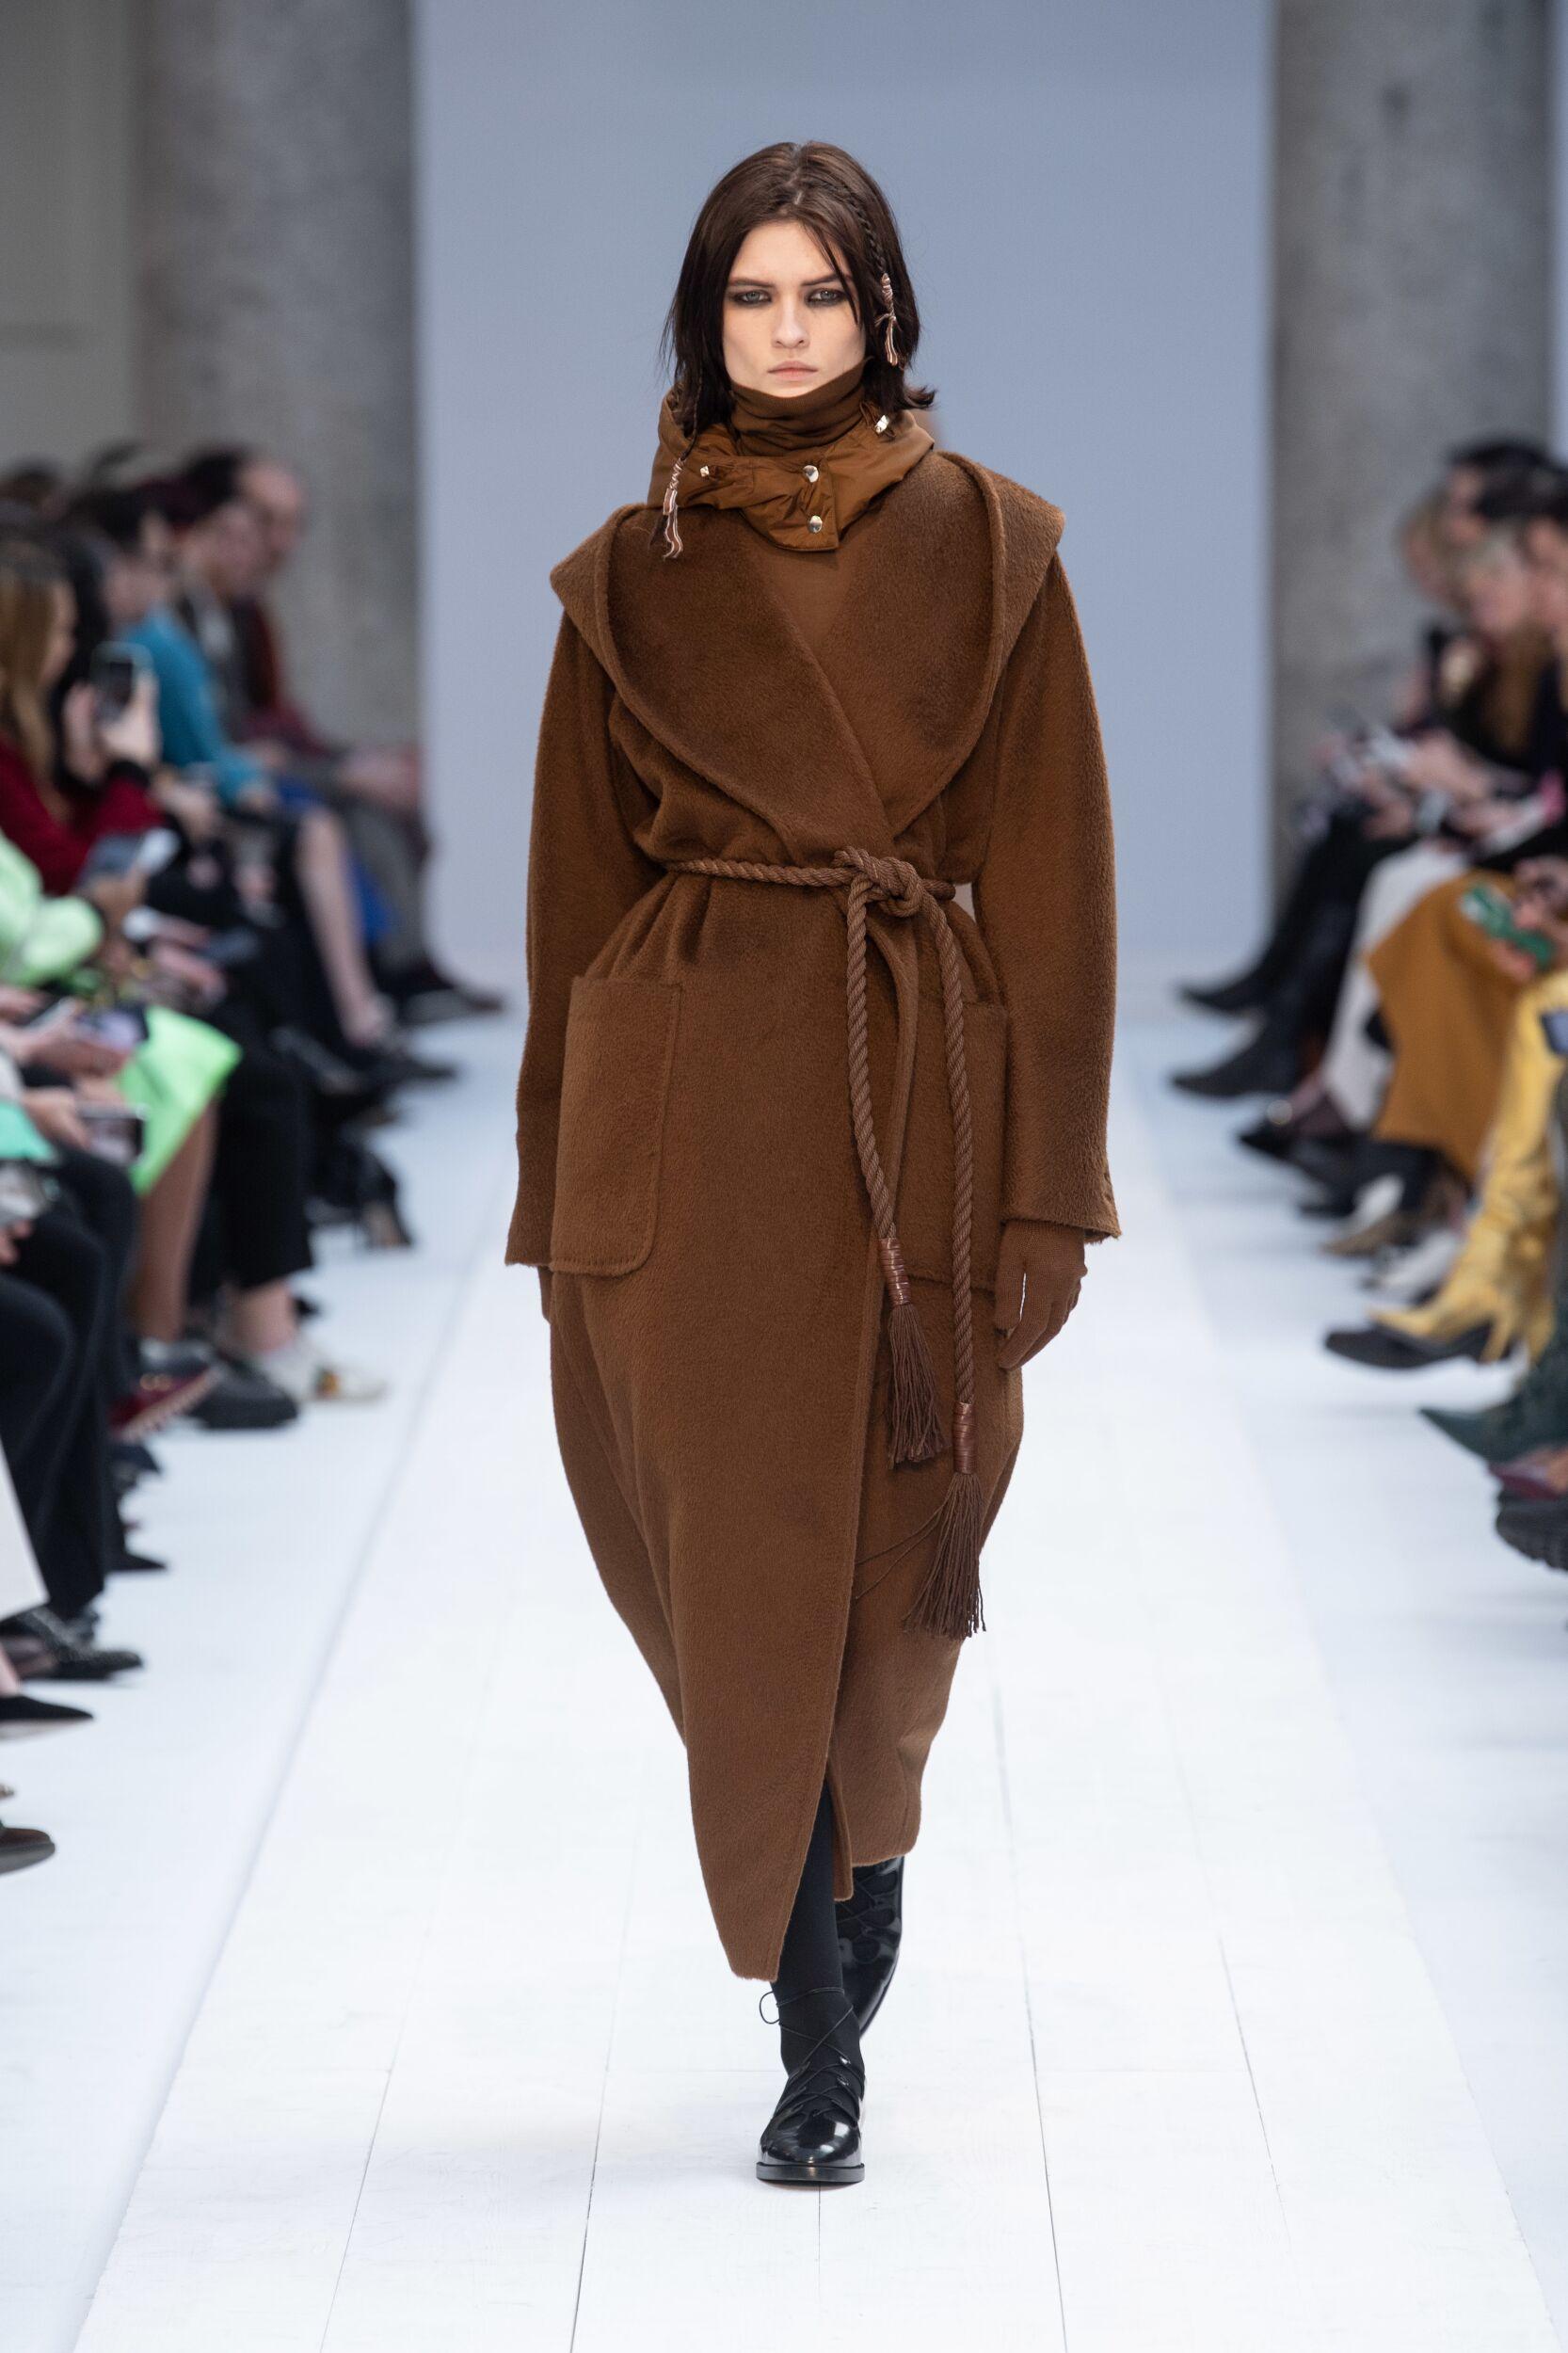 Catwalk Max Mara Woman Fashion Show Winter 2020